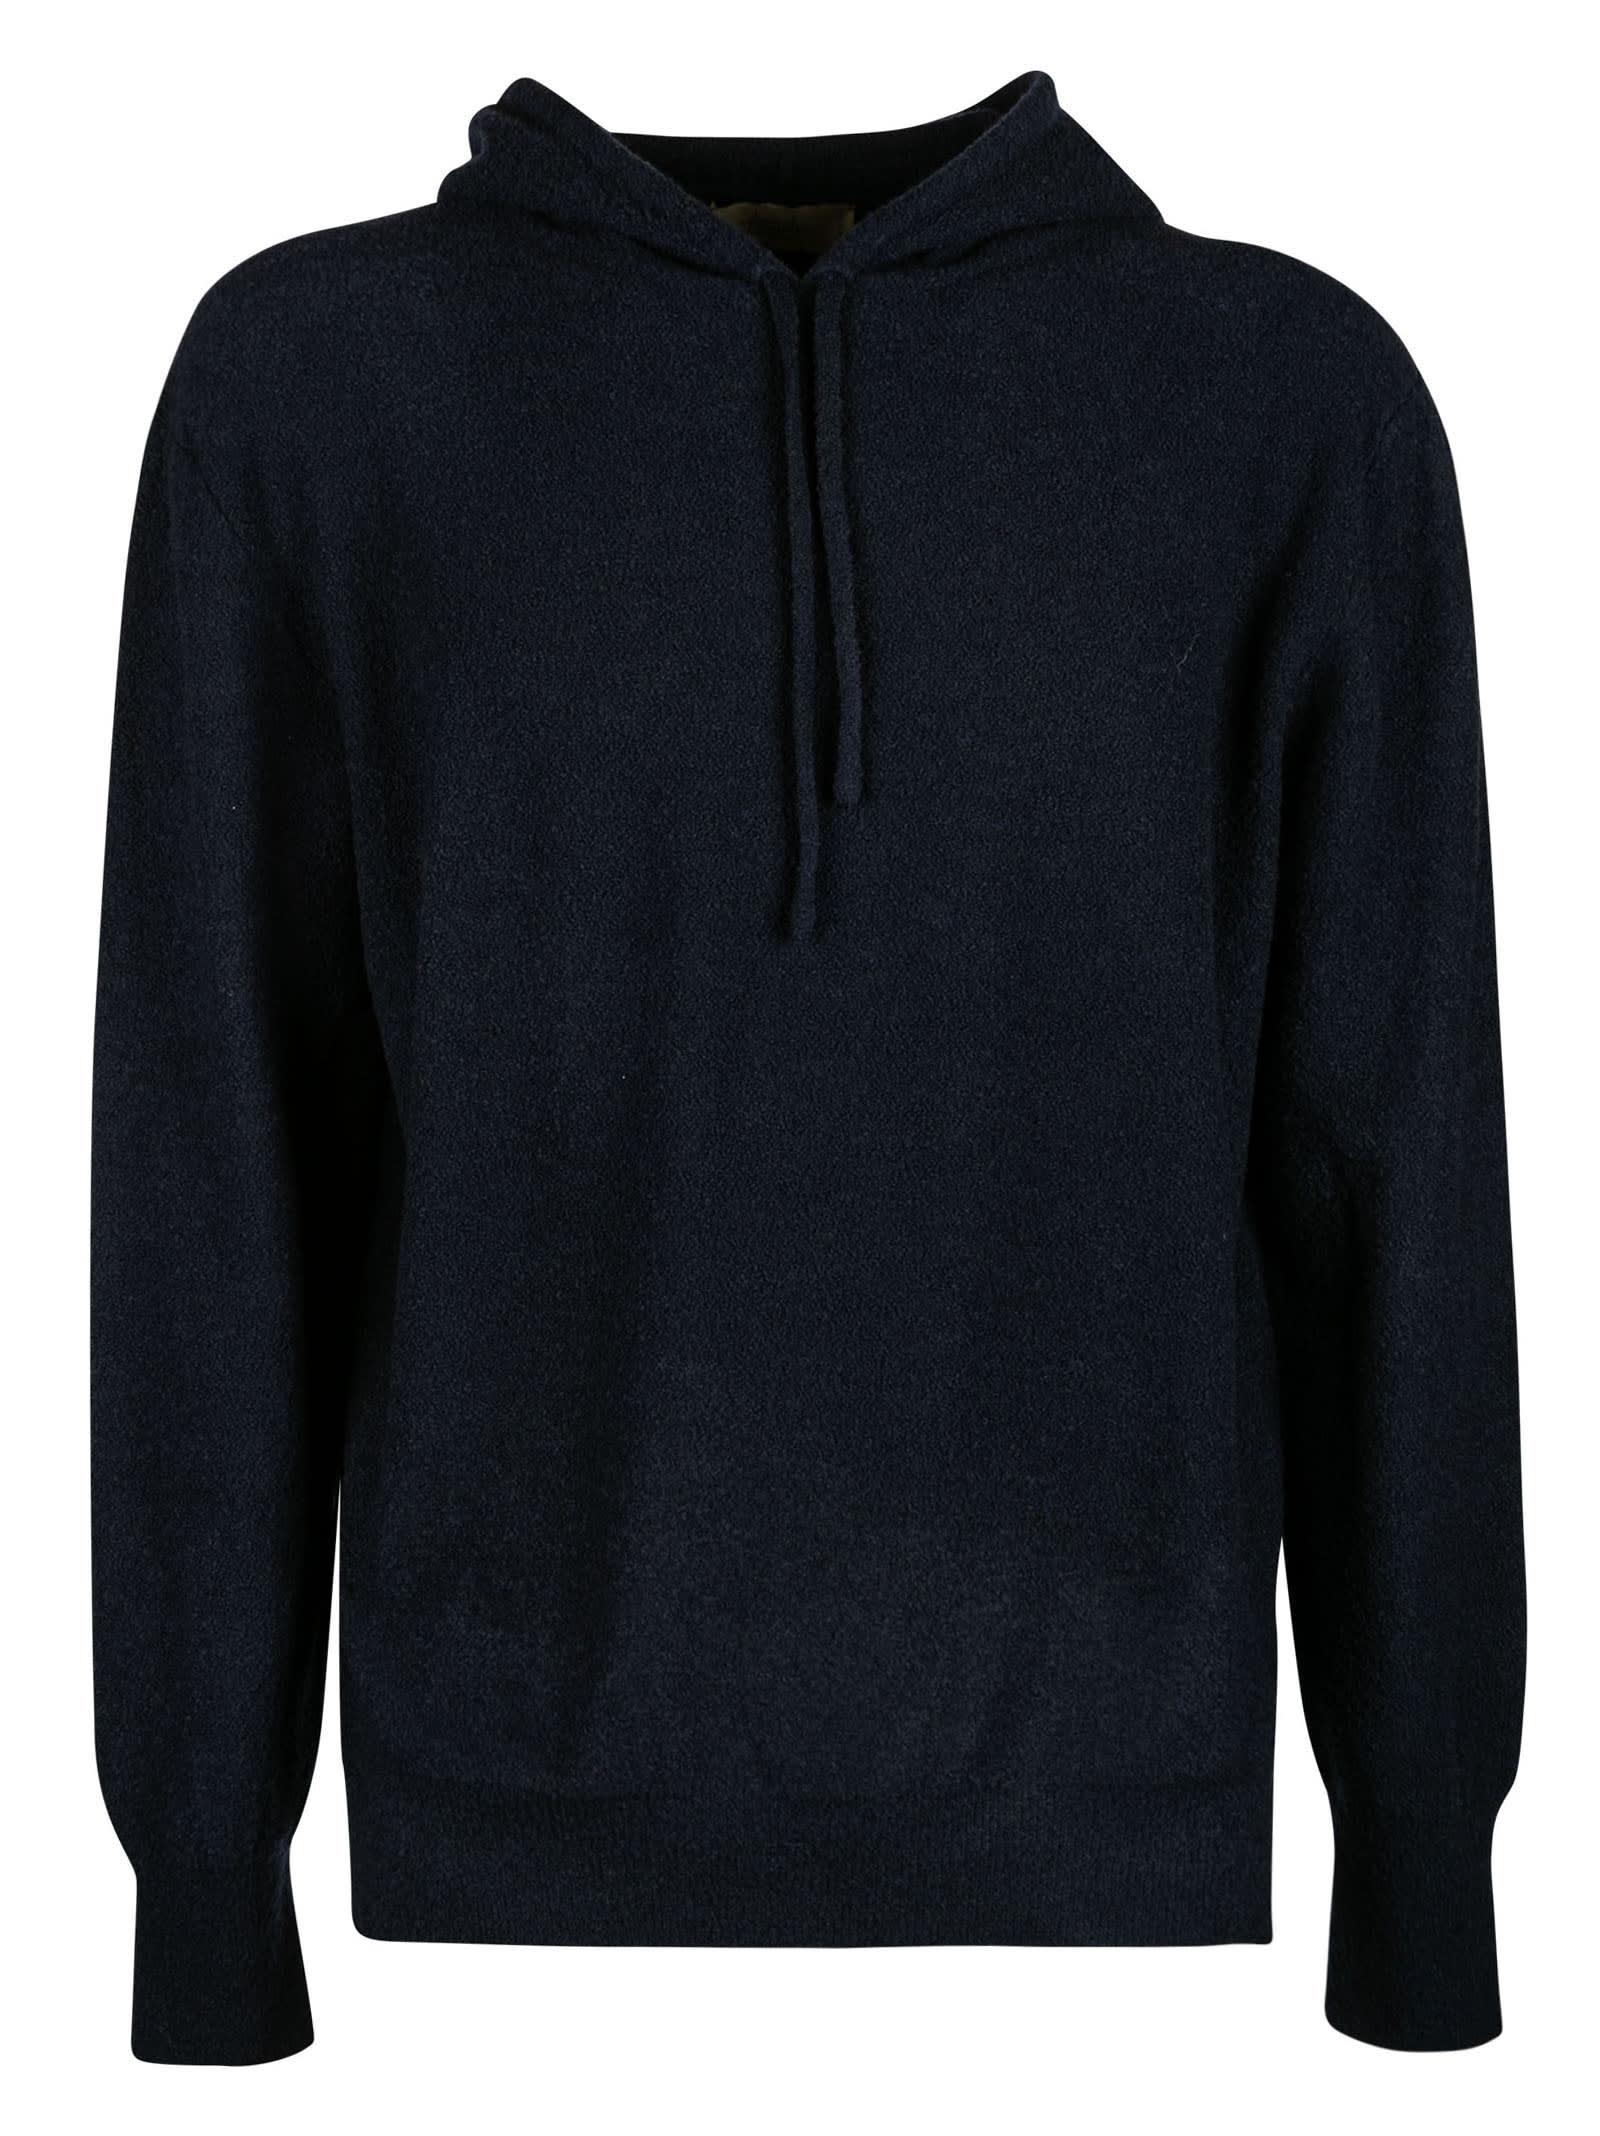 Plain Hooded Sweater